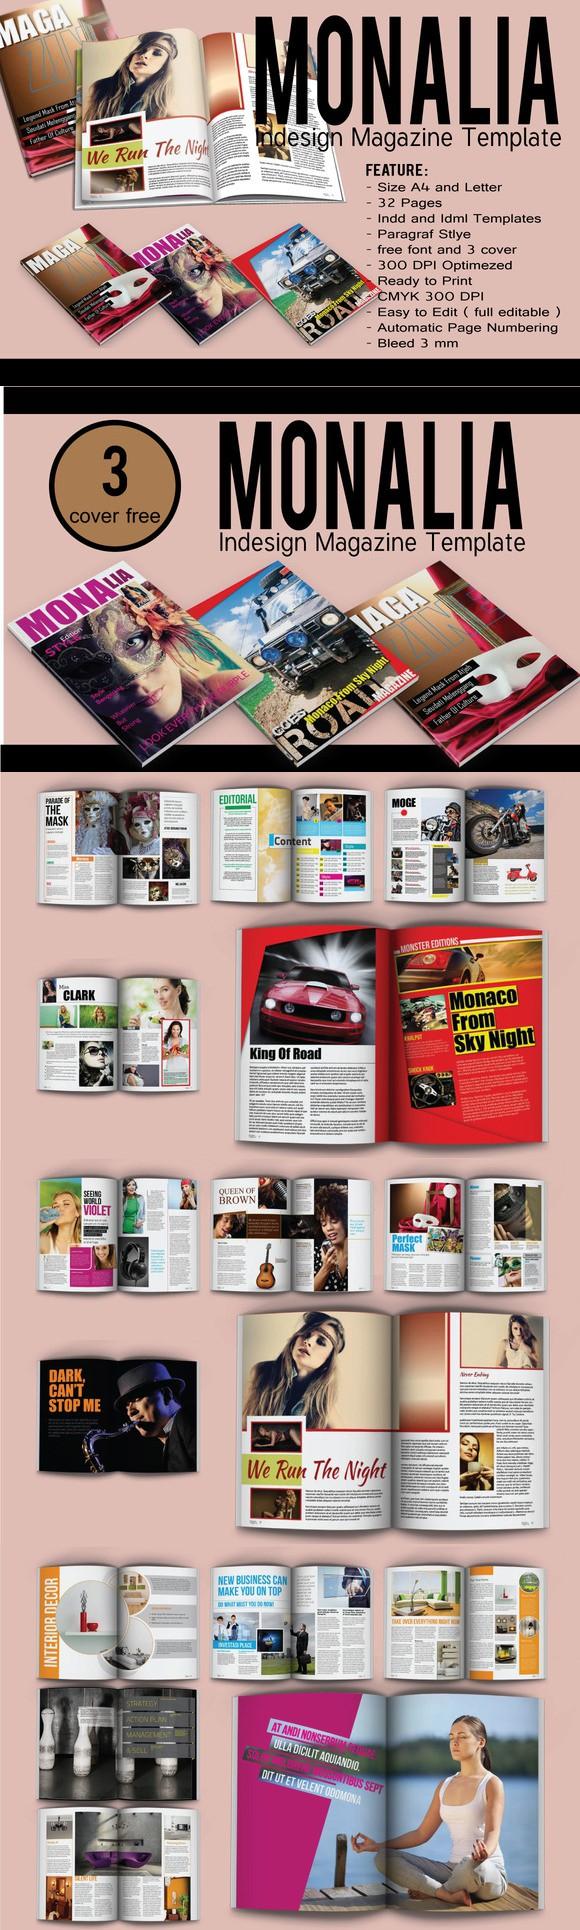 Monalia Indesign Magazine Template